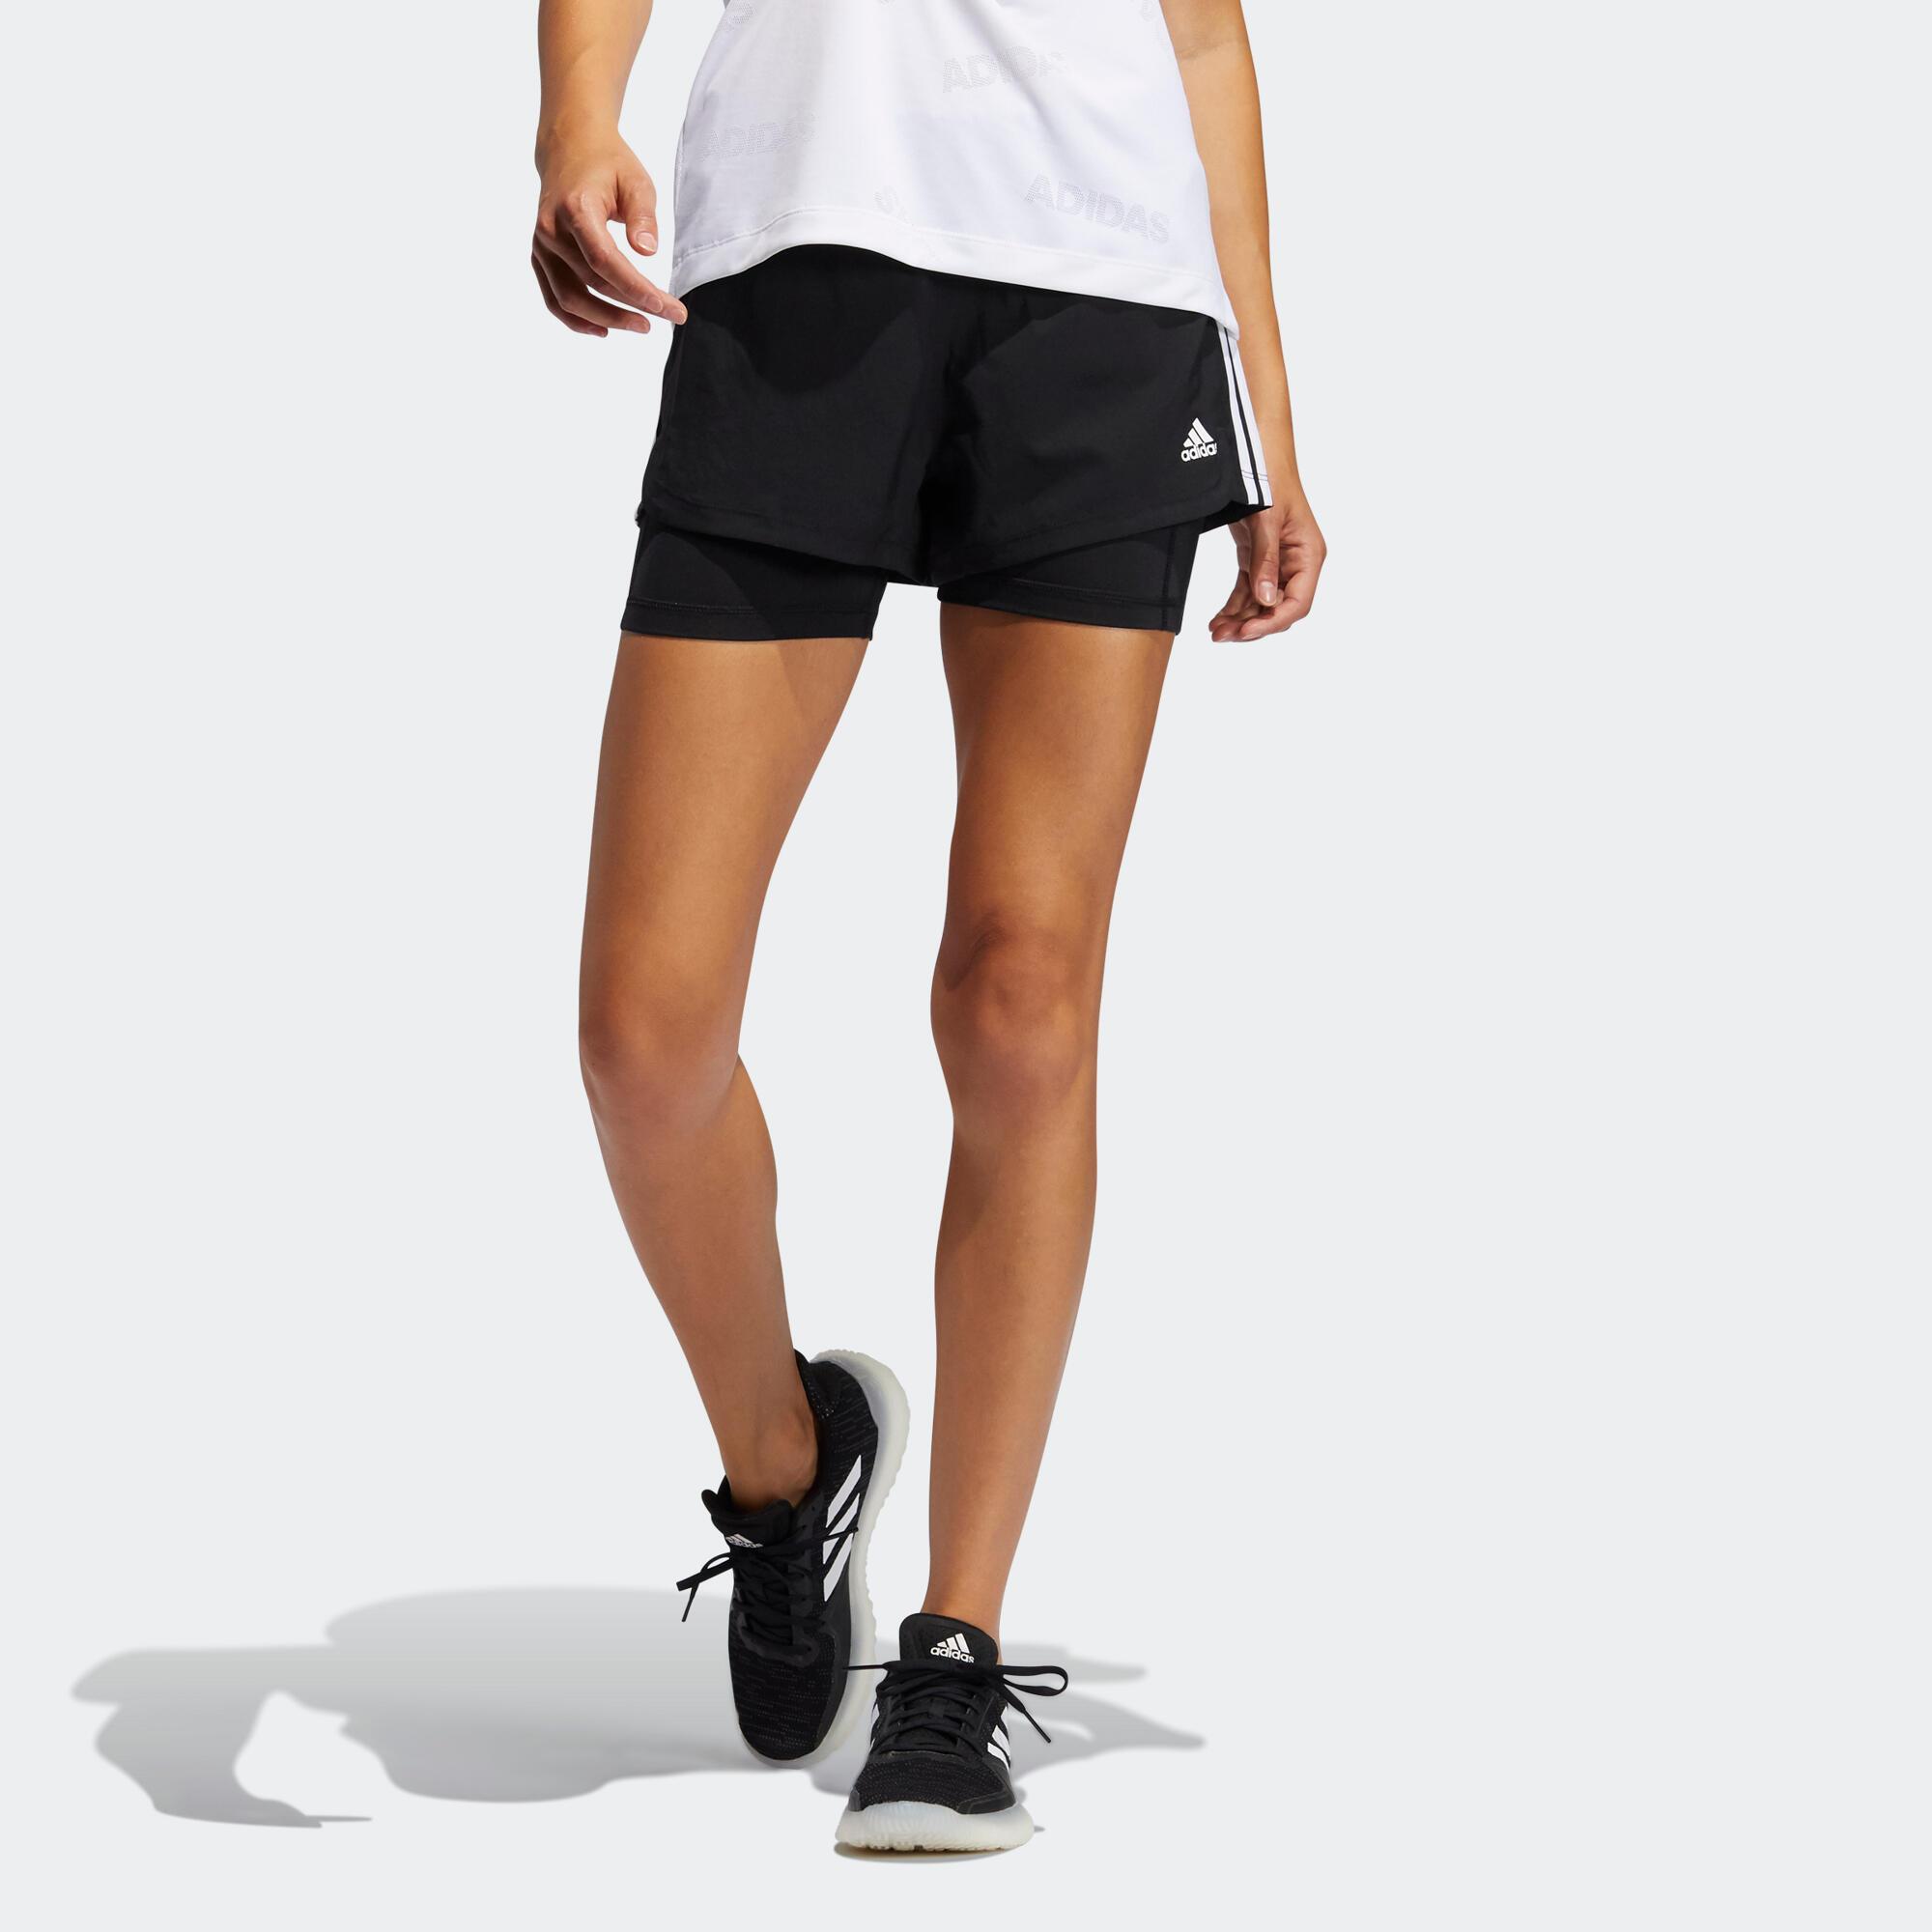 Short 2en1 Adidas fitness femme noir